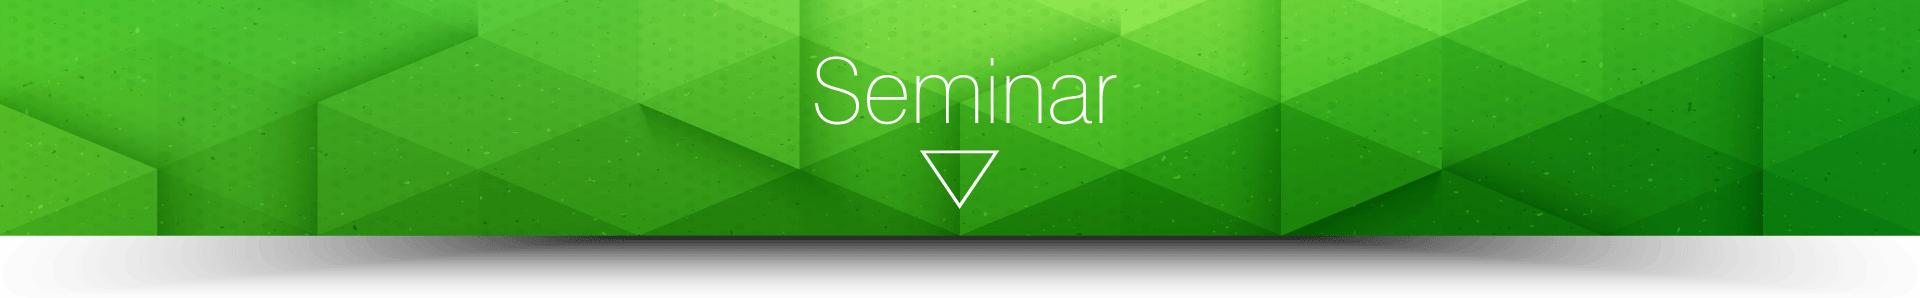 hdr-seminar